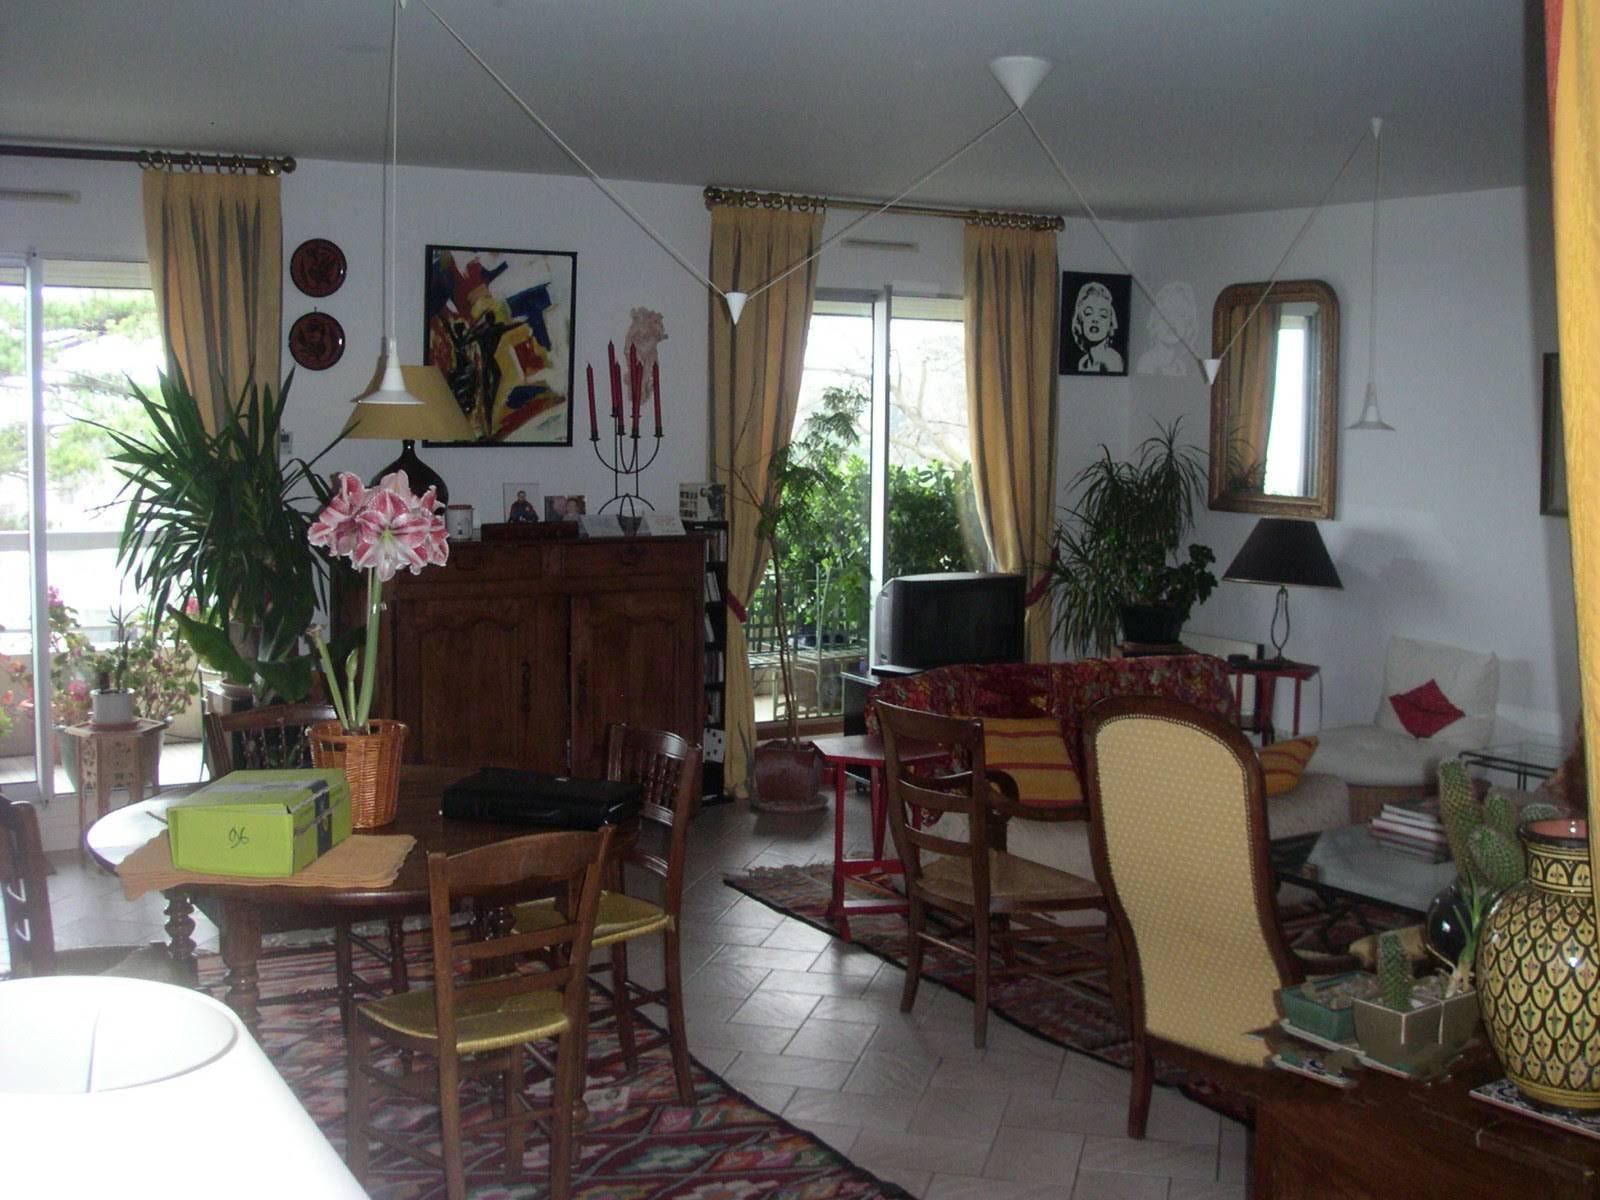 a vendre superbe appartement type 3 sainte adresse 76310 immobilier le havre adrian parker. Black Bedroom Furniture Sets. Home Design Ideas